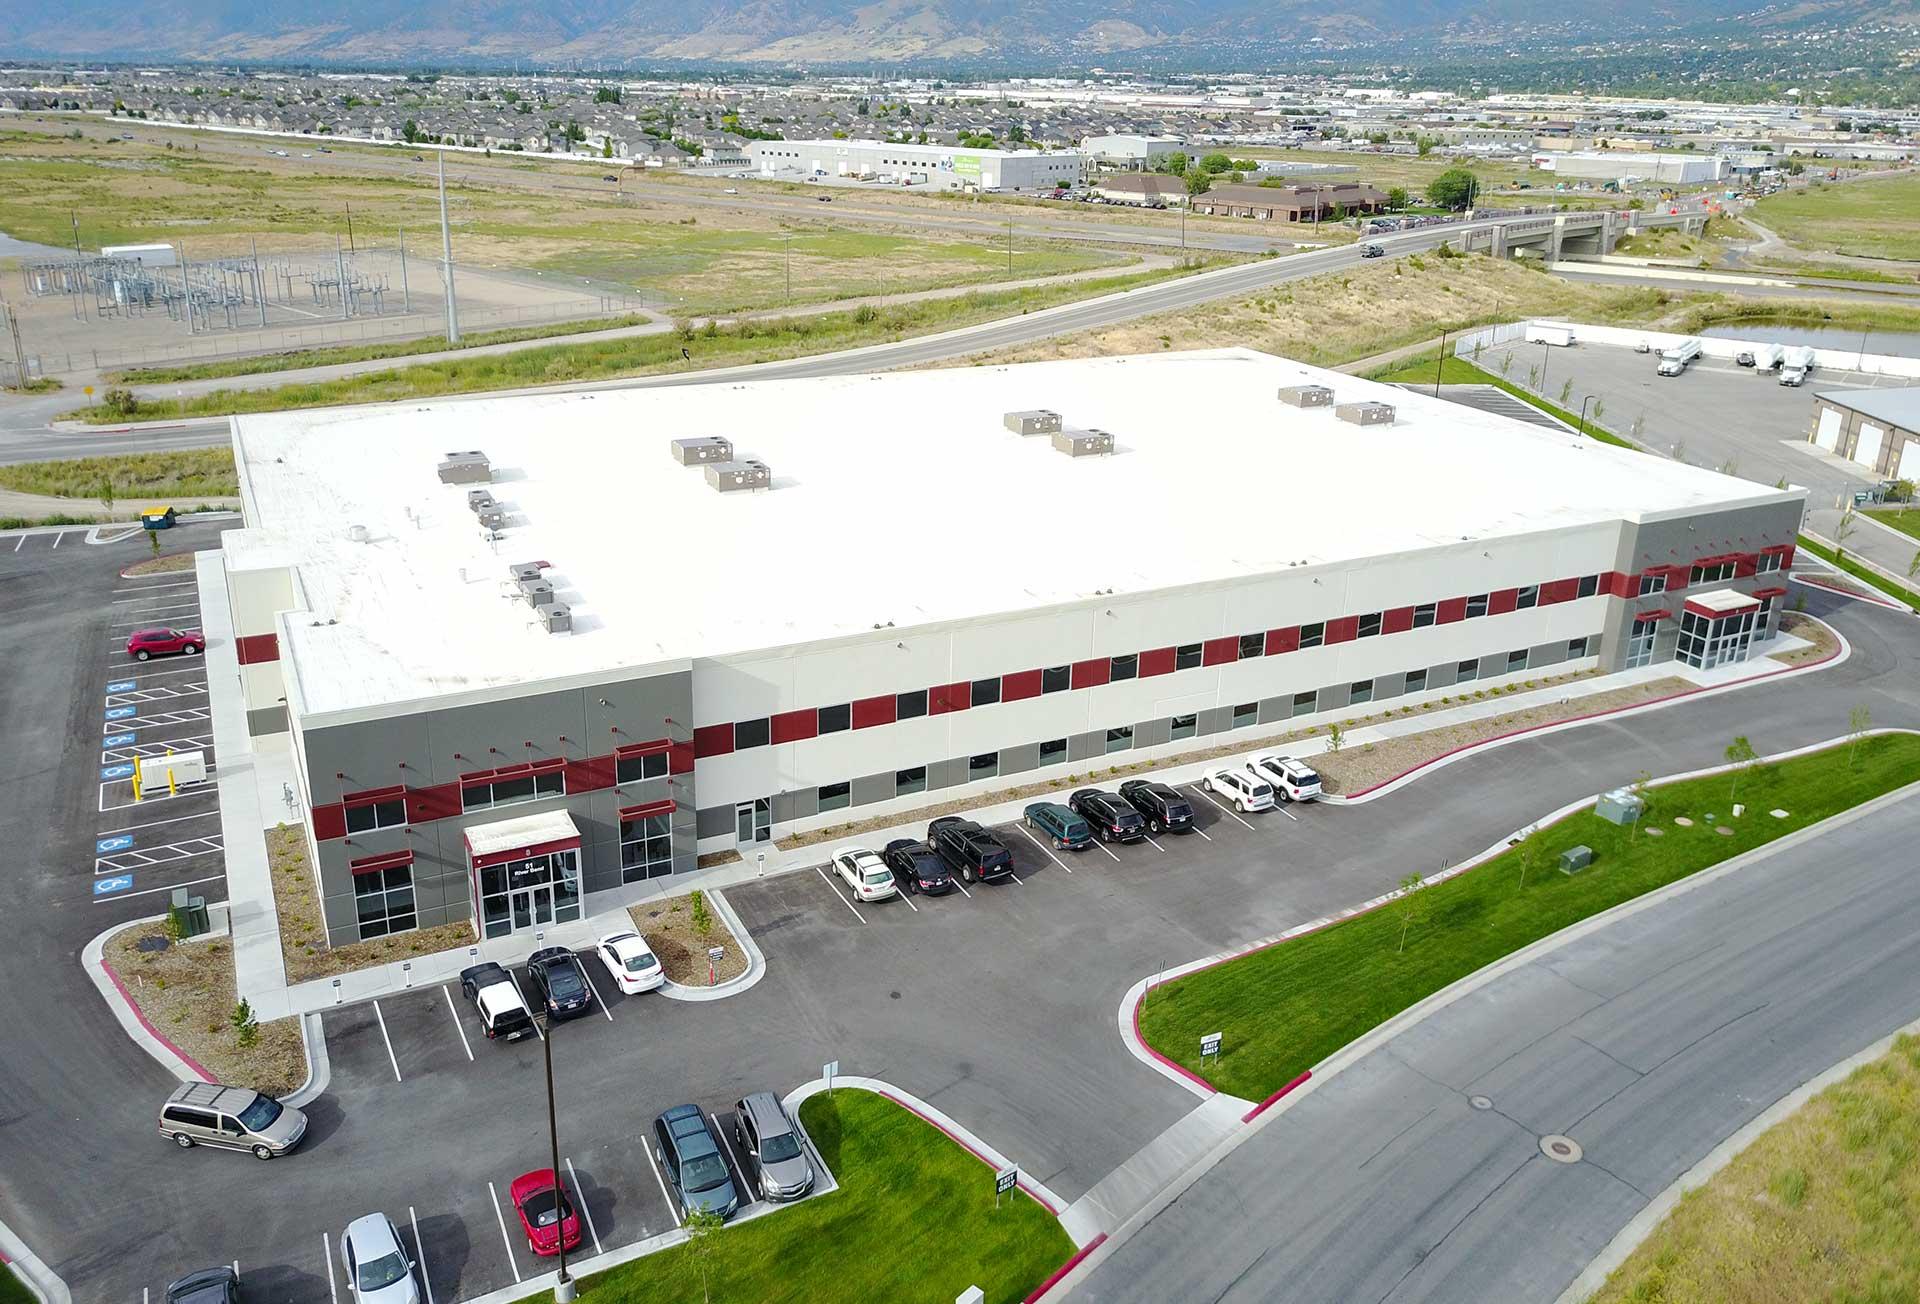 51 South River Bend Way, North Salt Lake, UT 84054